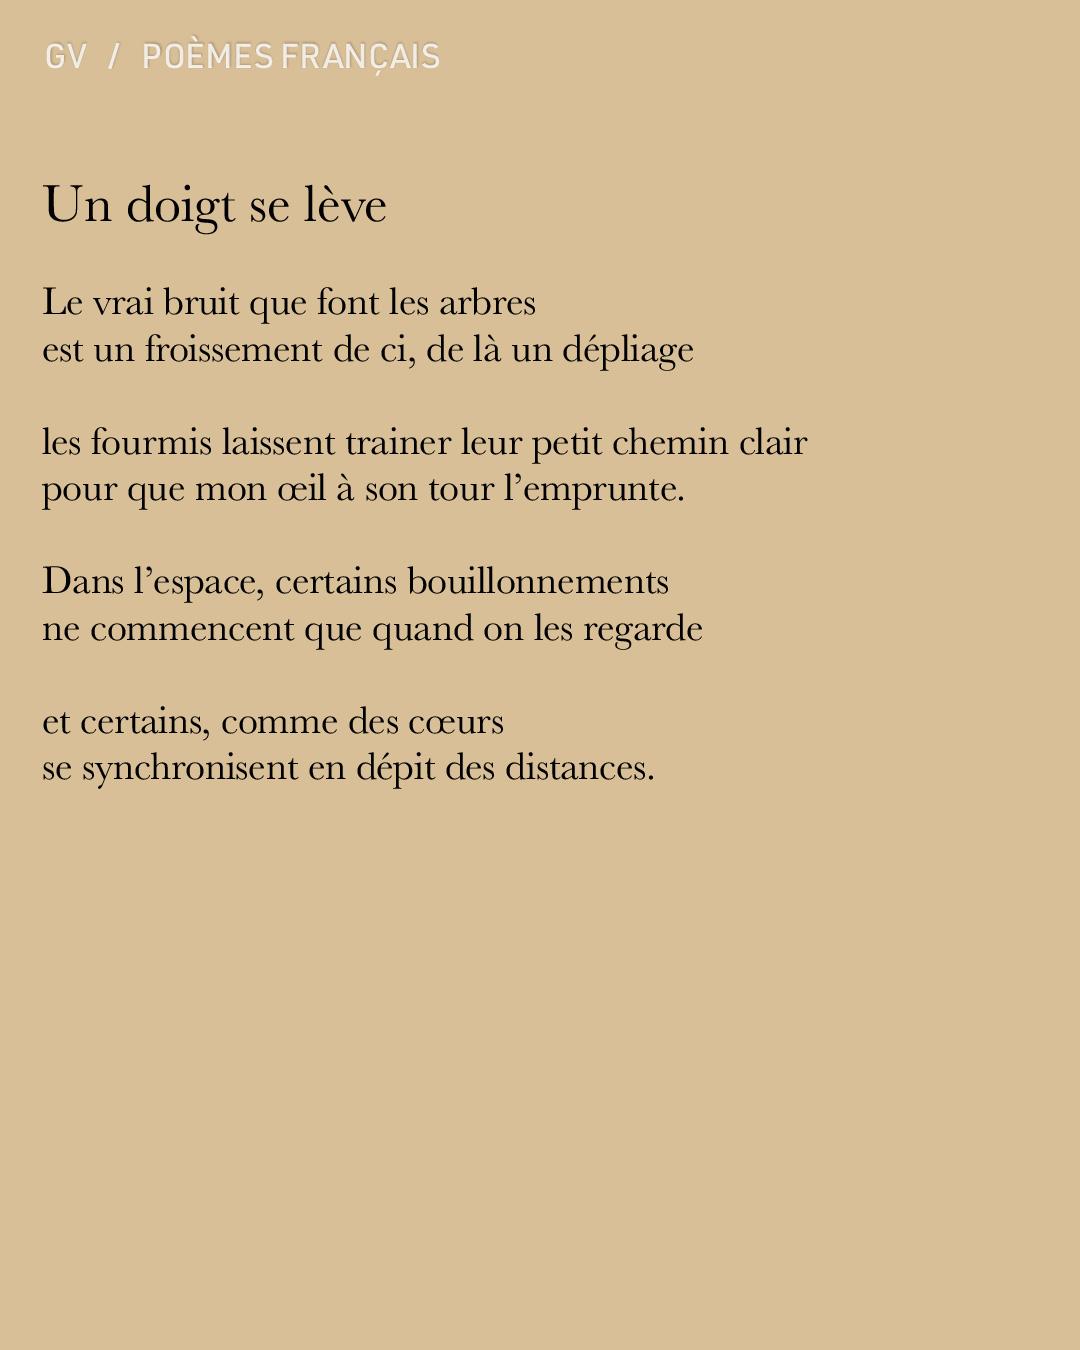 Gvion-PoemesF-UnDoigt.jpg